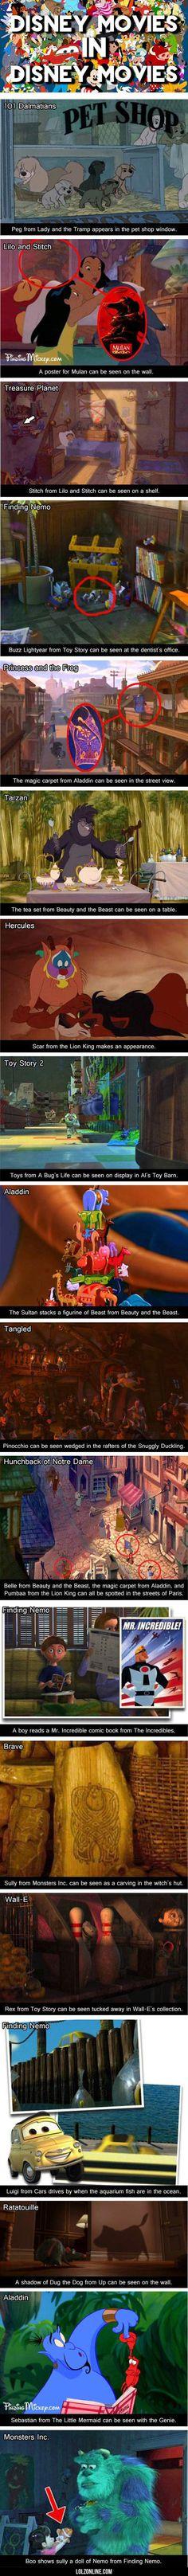 Disney Films Inside Other Disney Films#funny #lol #lolzonline